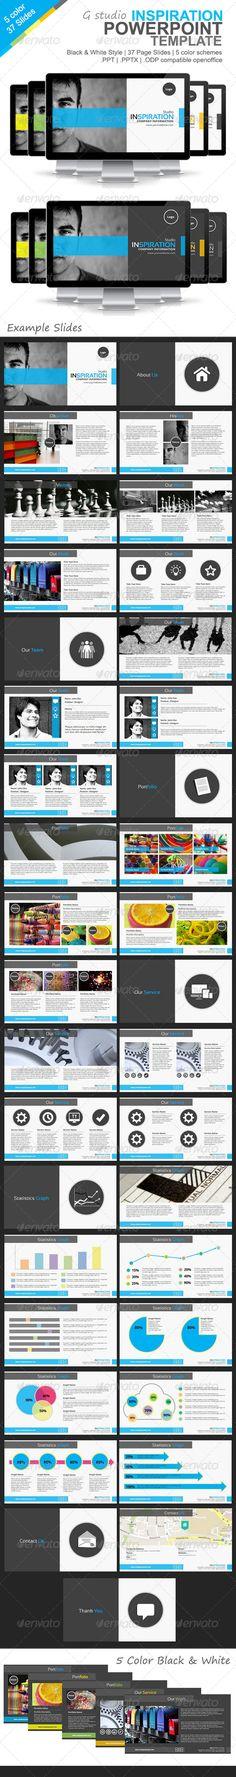 Gstudio Inspiration Powerpoint Template - Presentation Templates